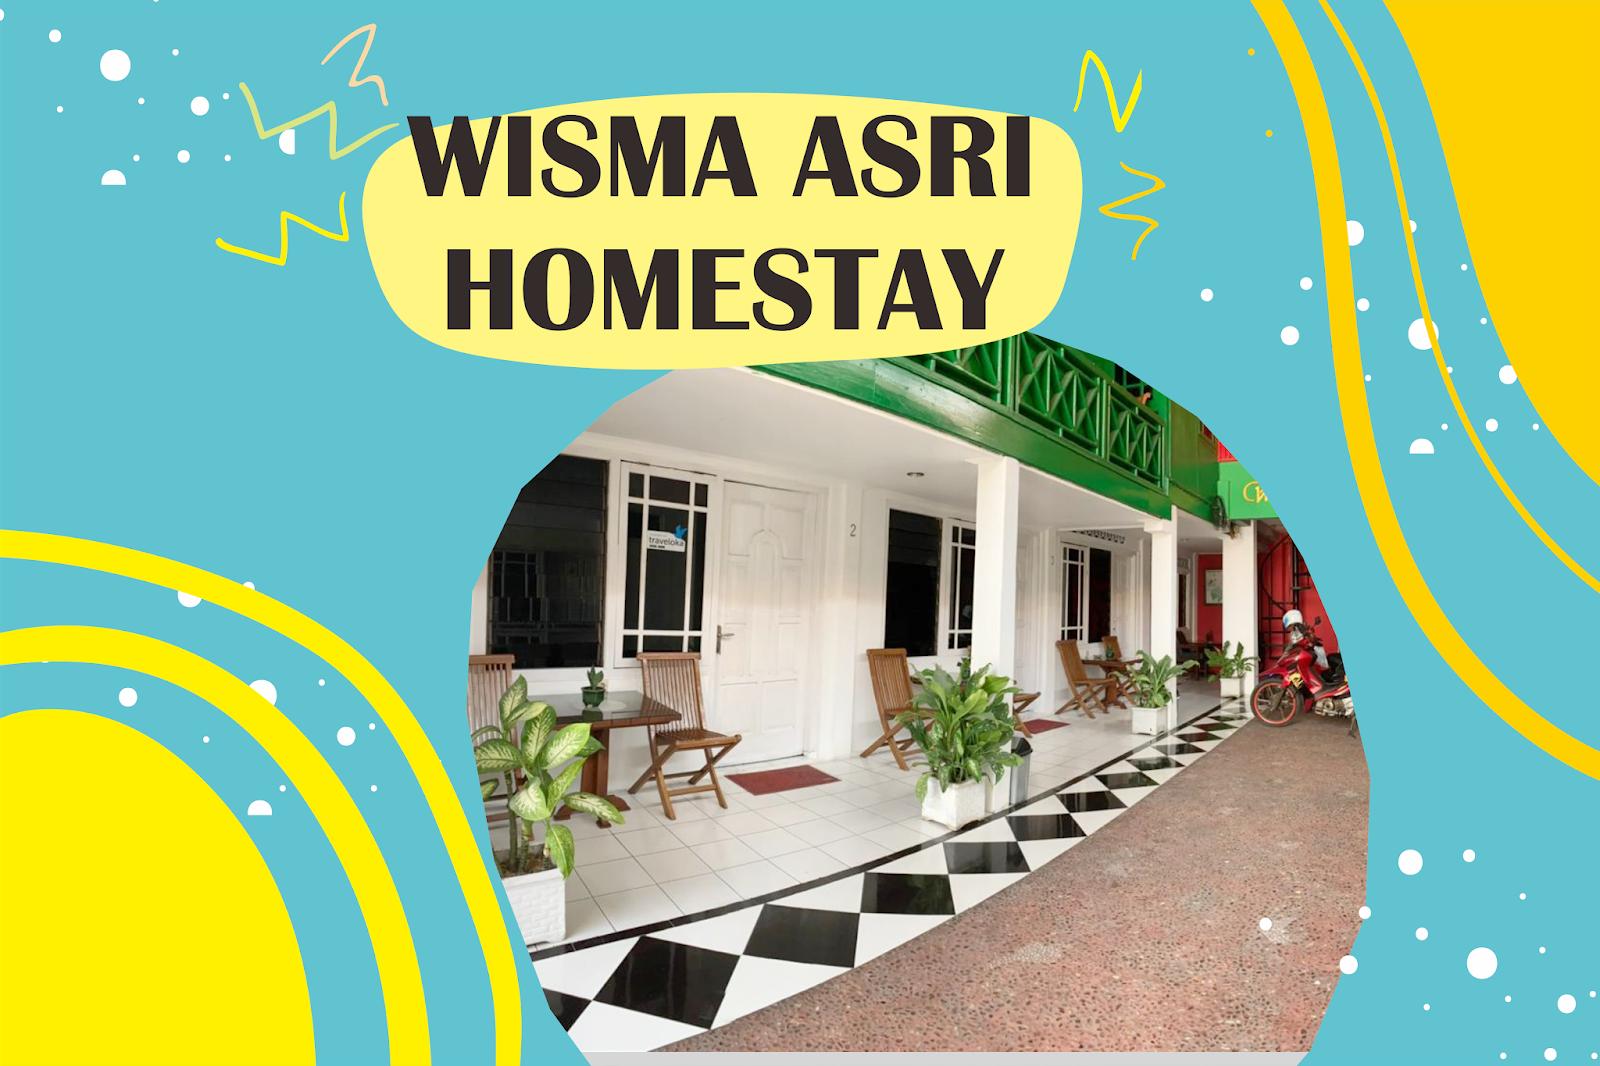 Wisma Asri Homestay